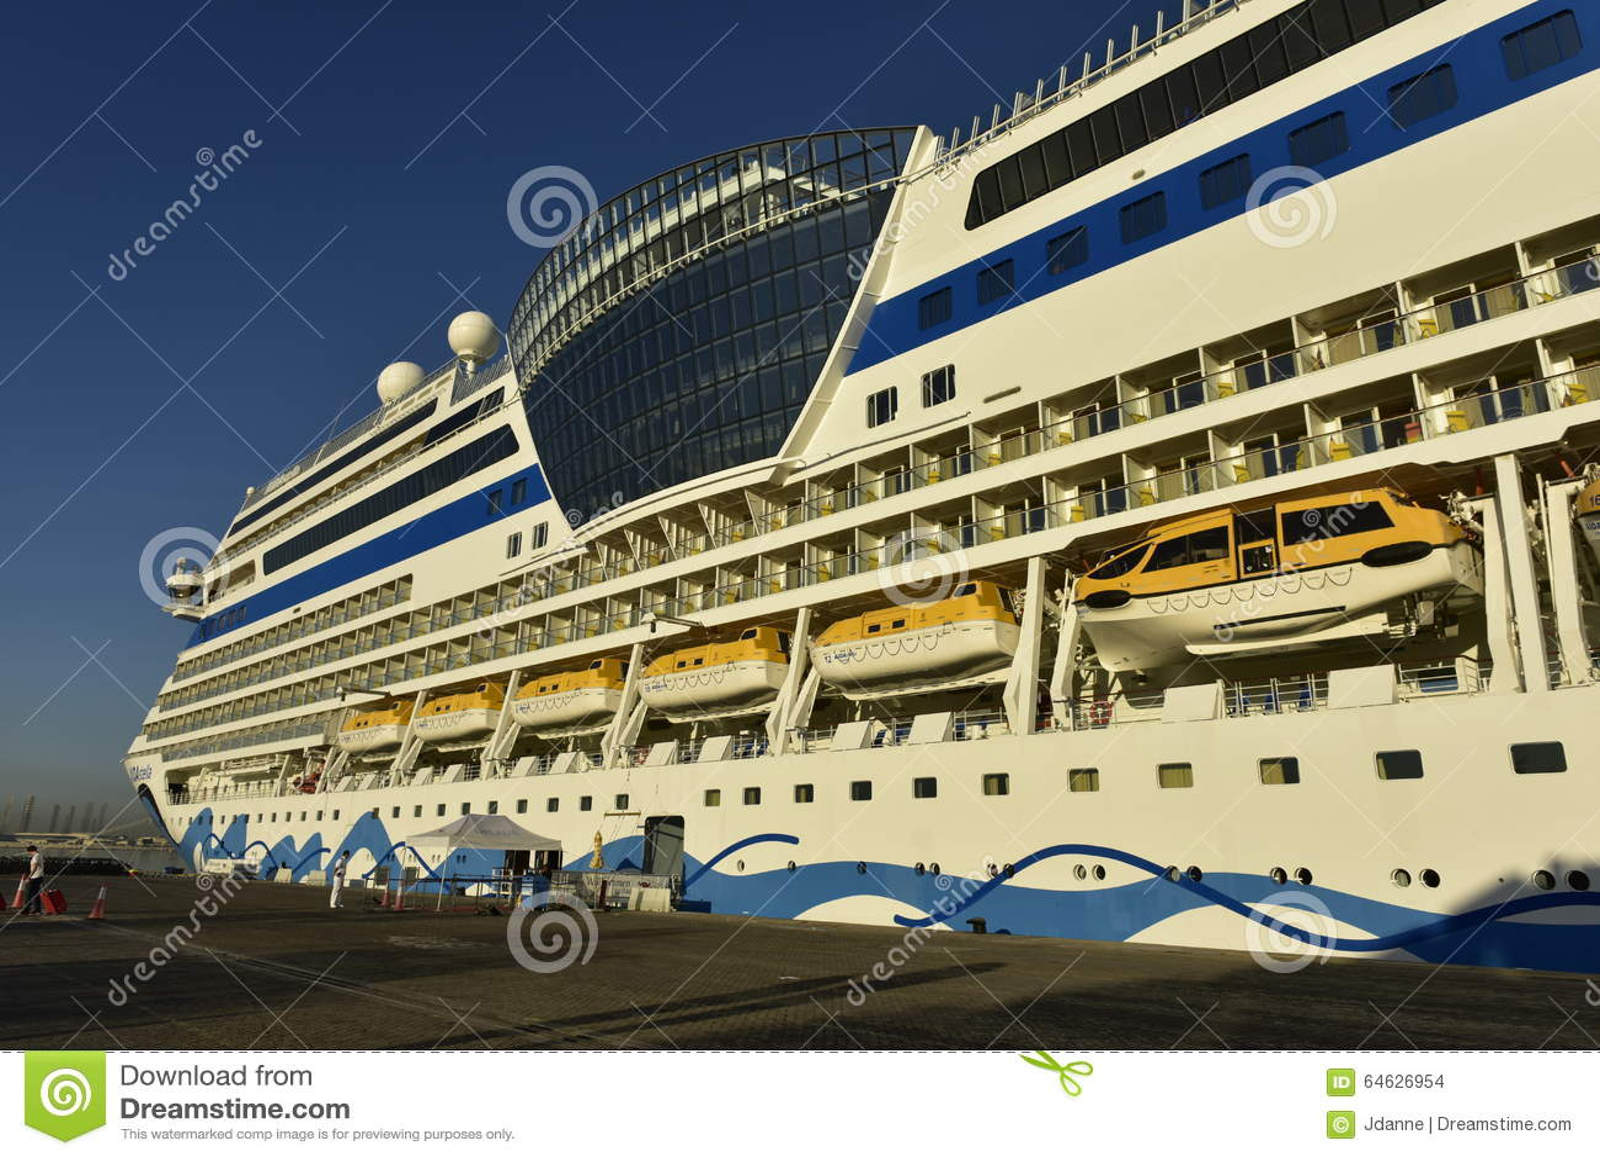 Cruise Ship AIDA Stella In The Harbour Of Dubai United